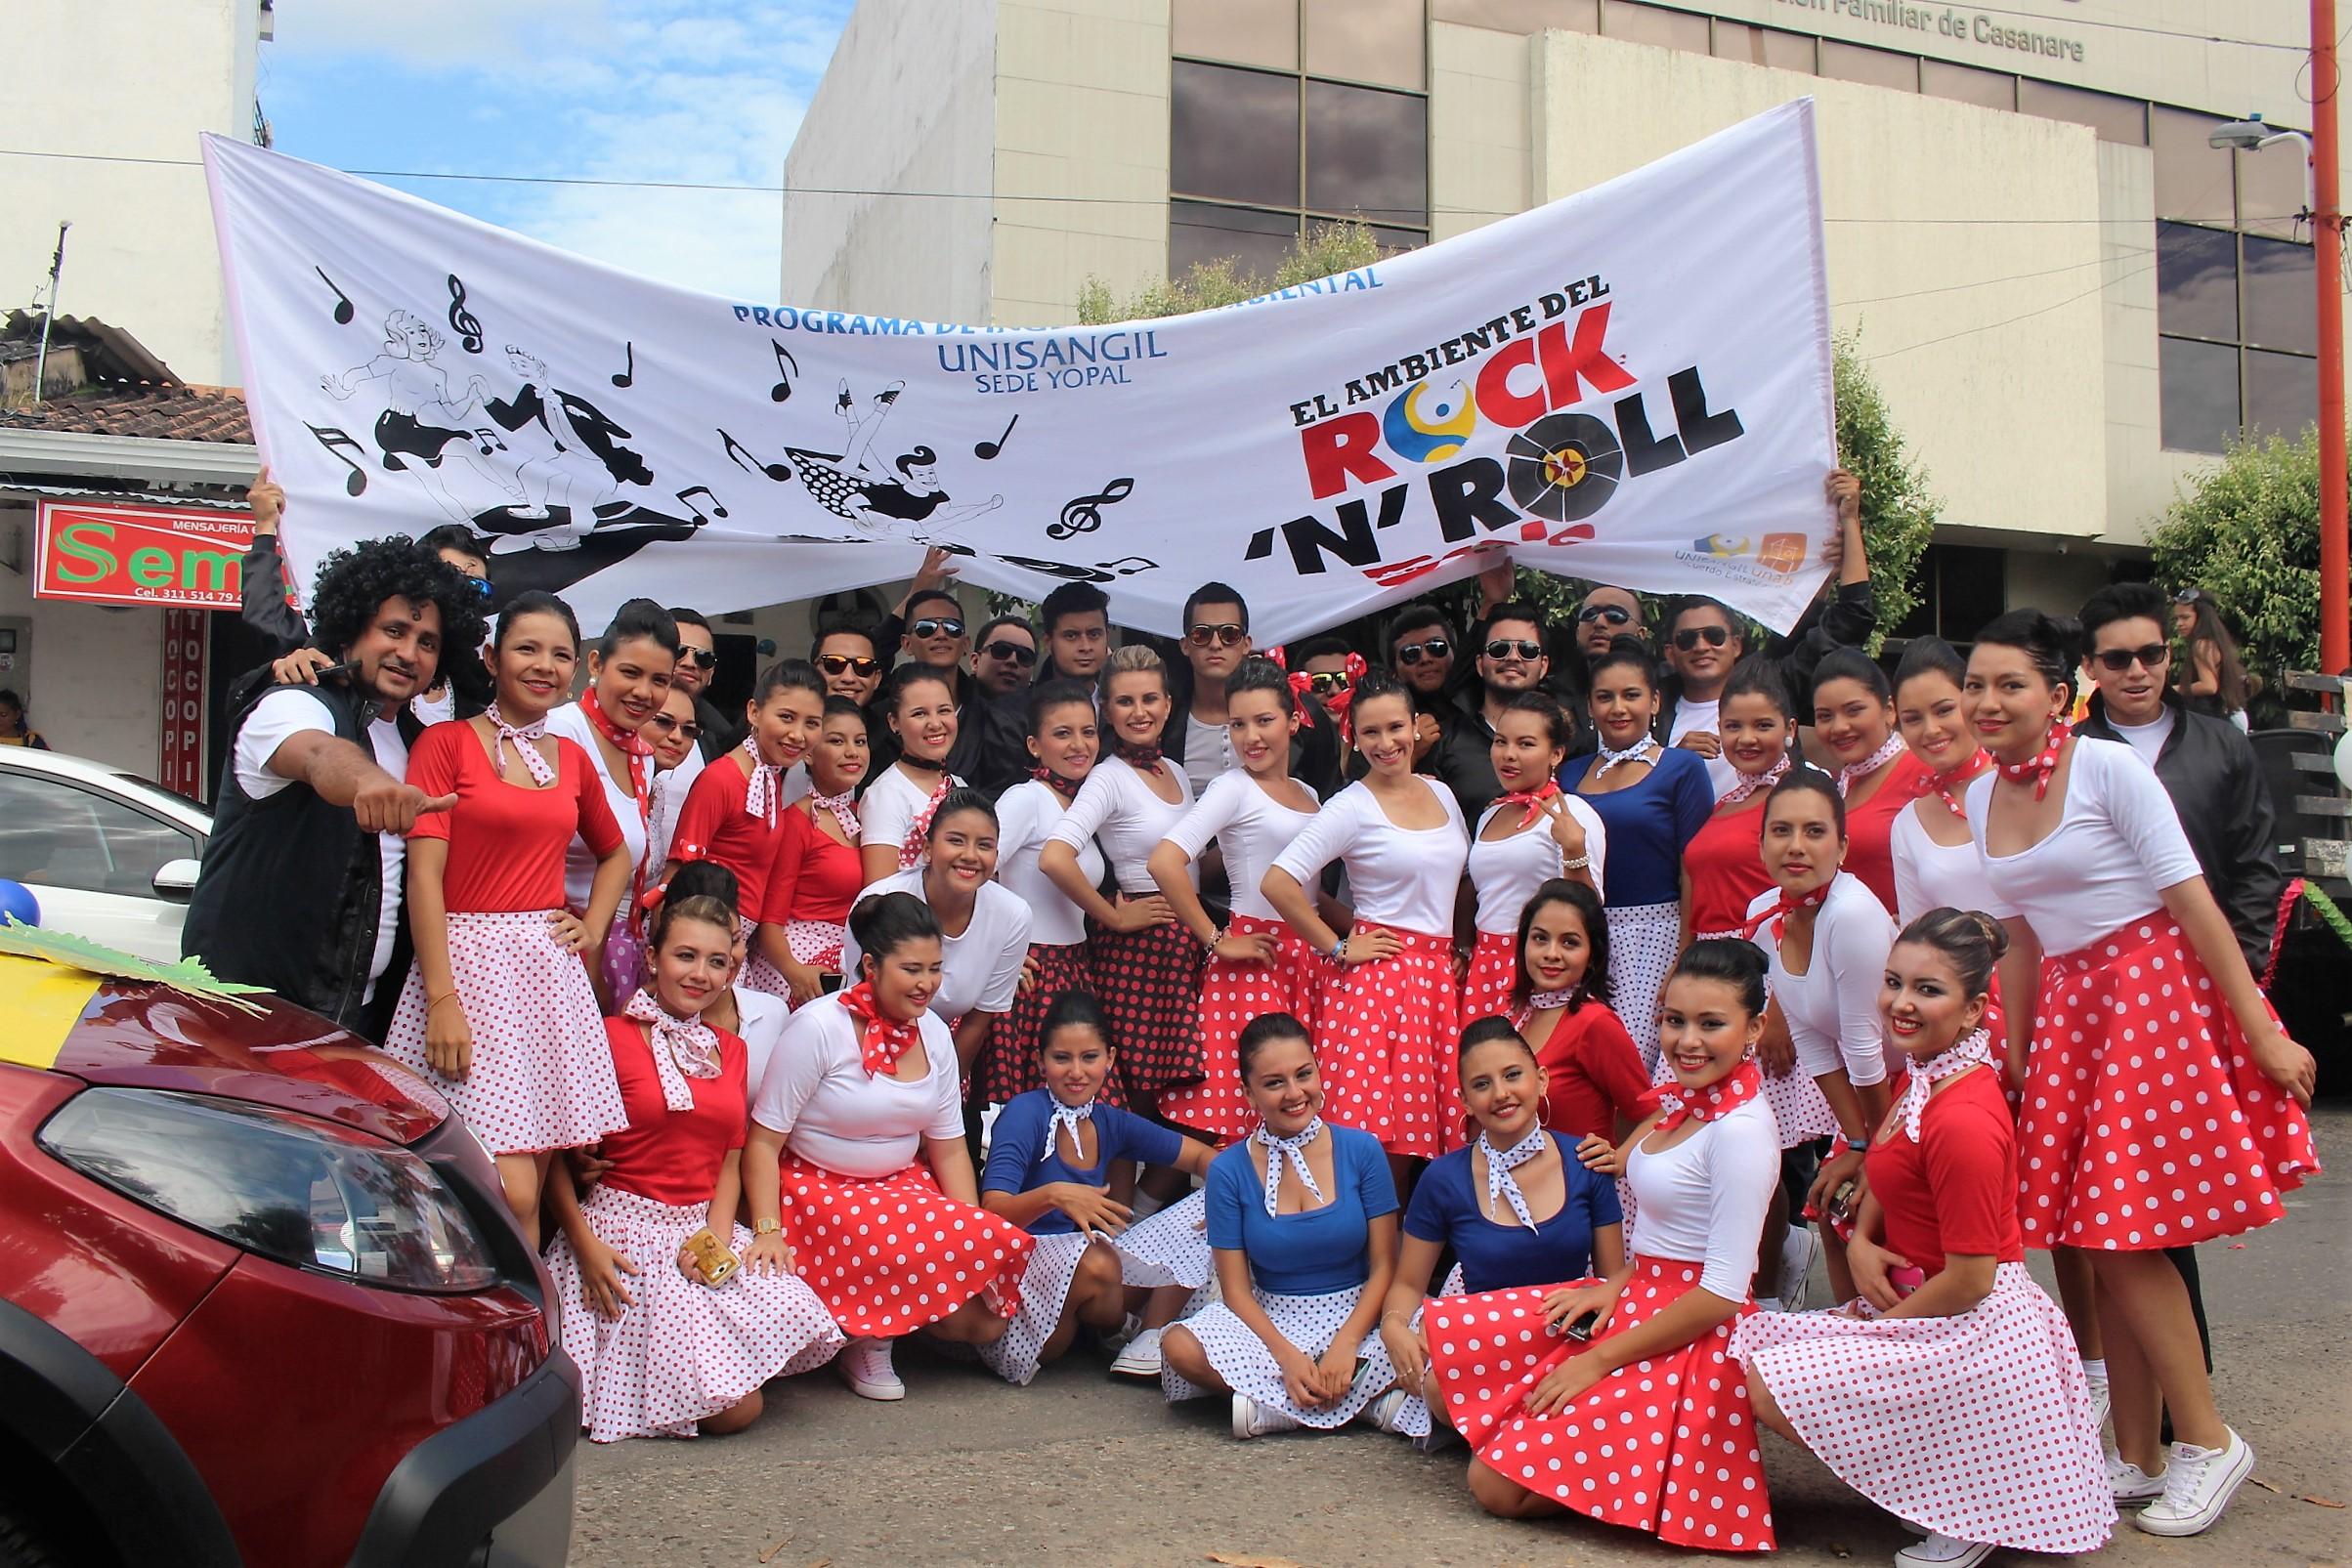 XVIII jornada cultural de Unisangil todo un éxito